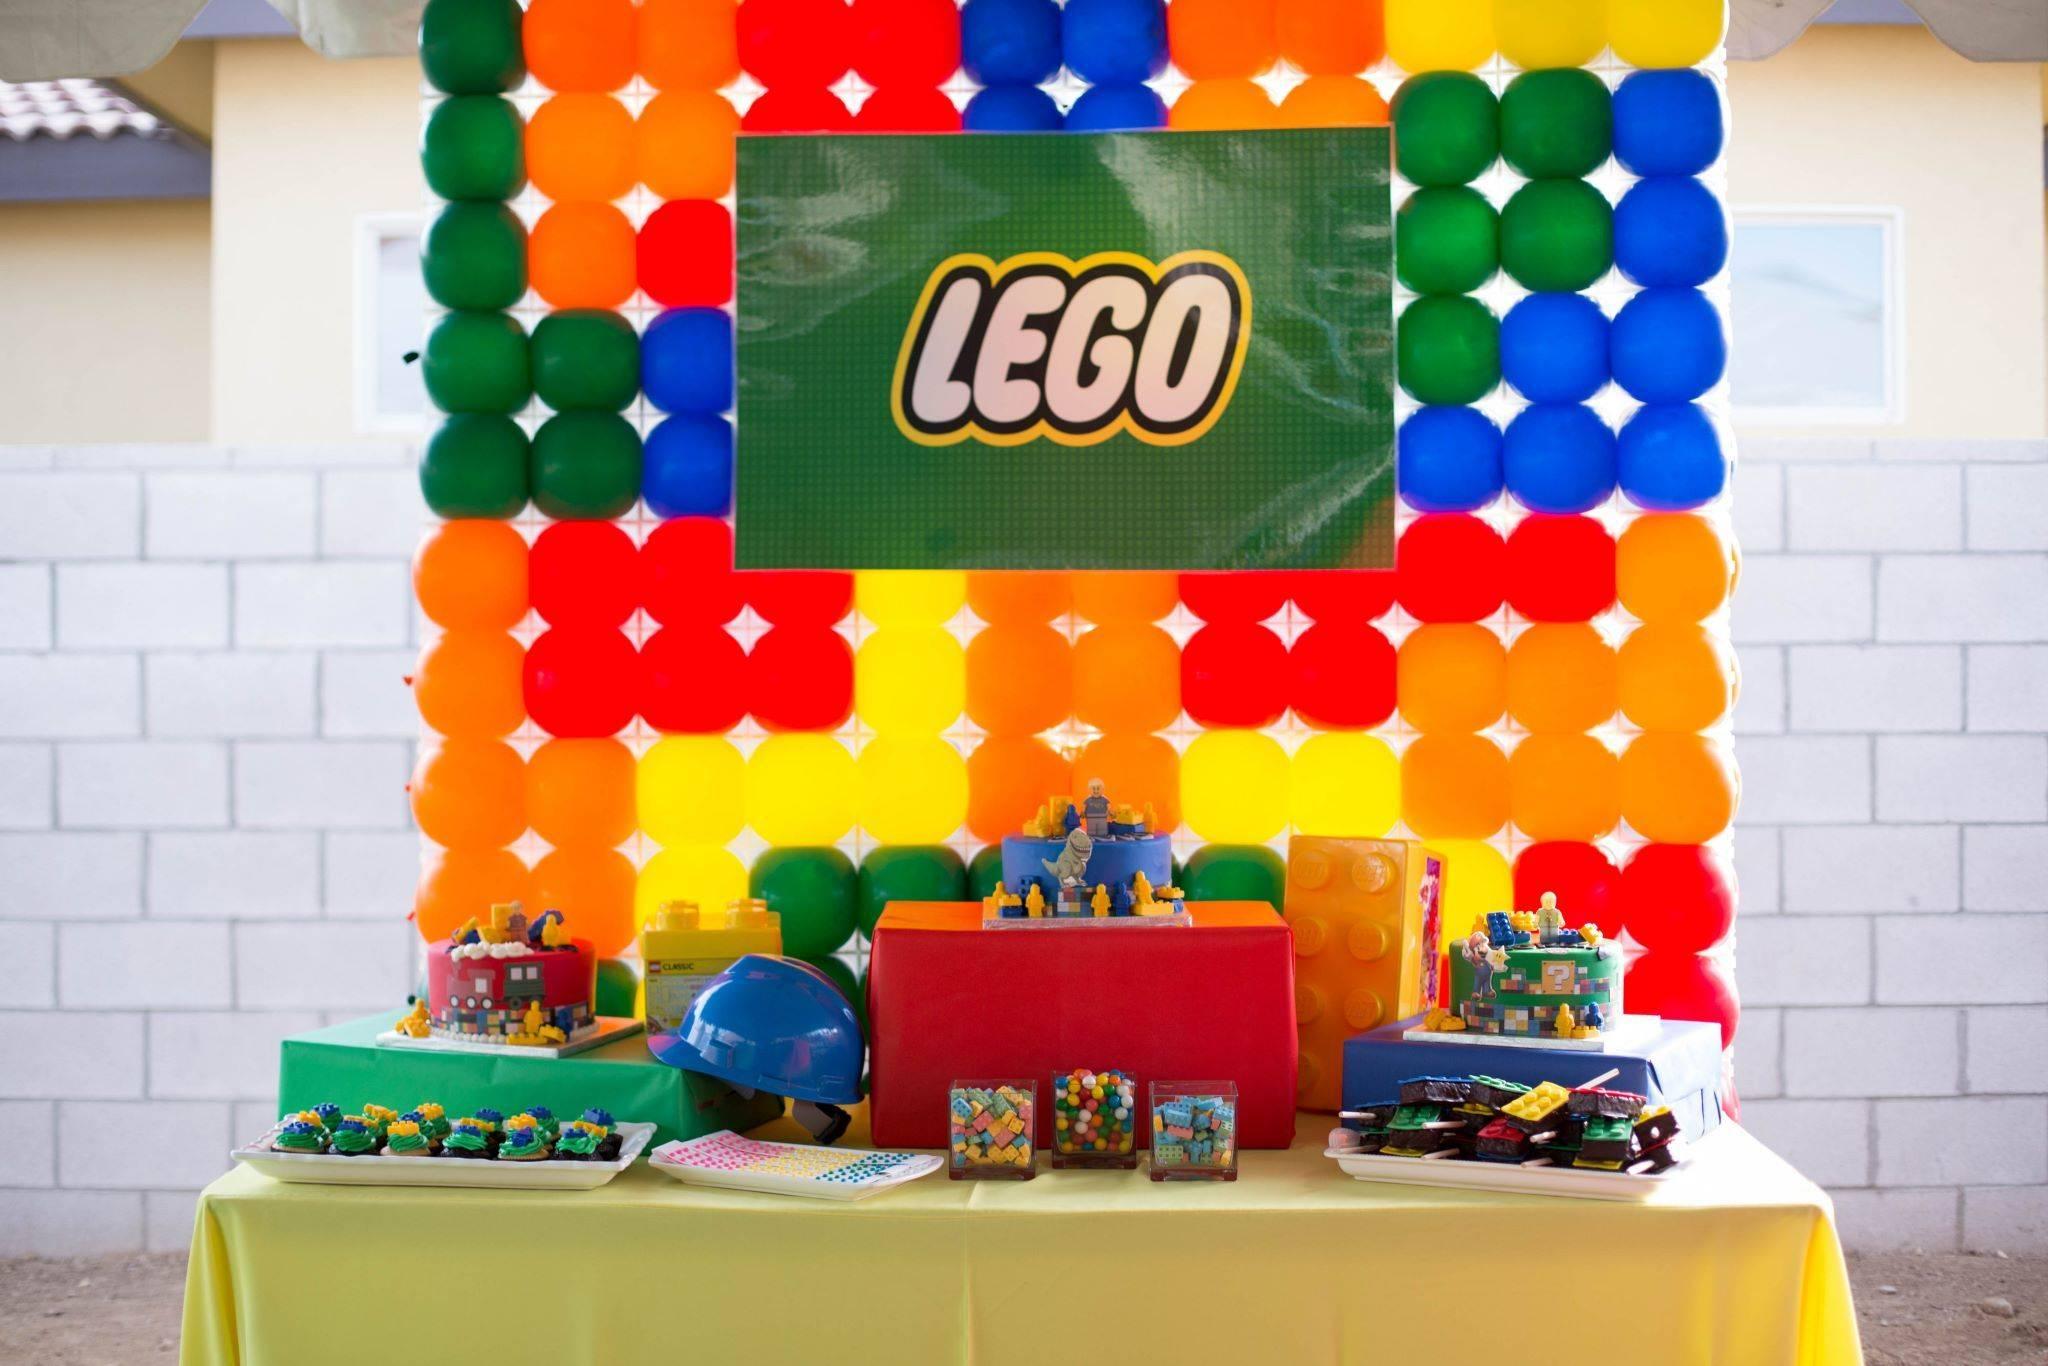 Hair-Lego-Birthday-12-5-15-Hair-Lego-Birthday-12-5-15-0067.jpg